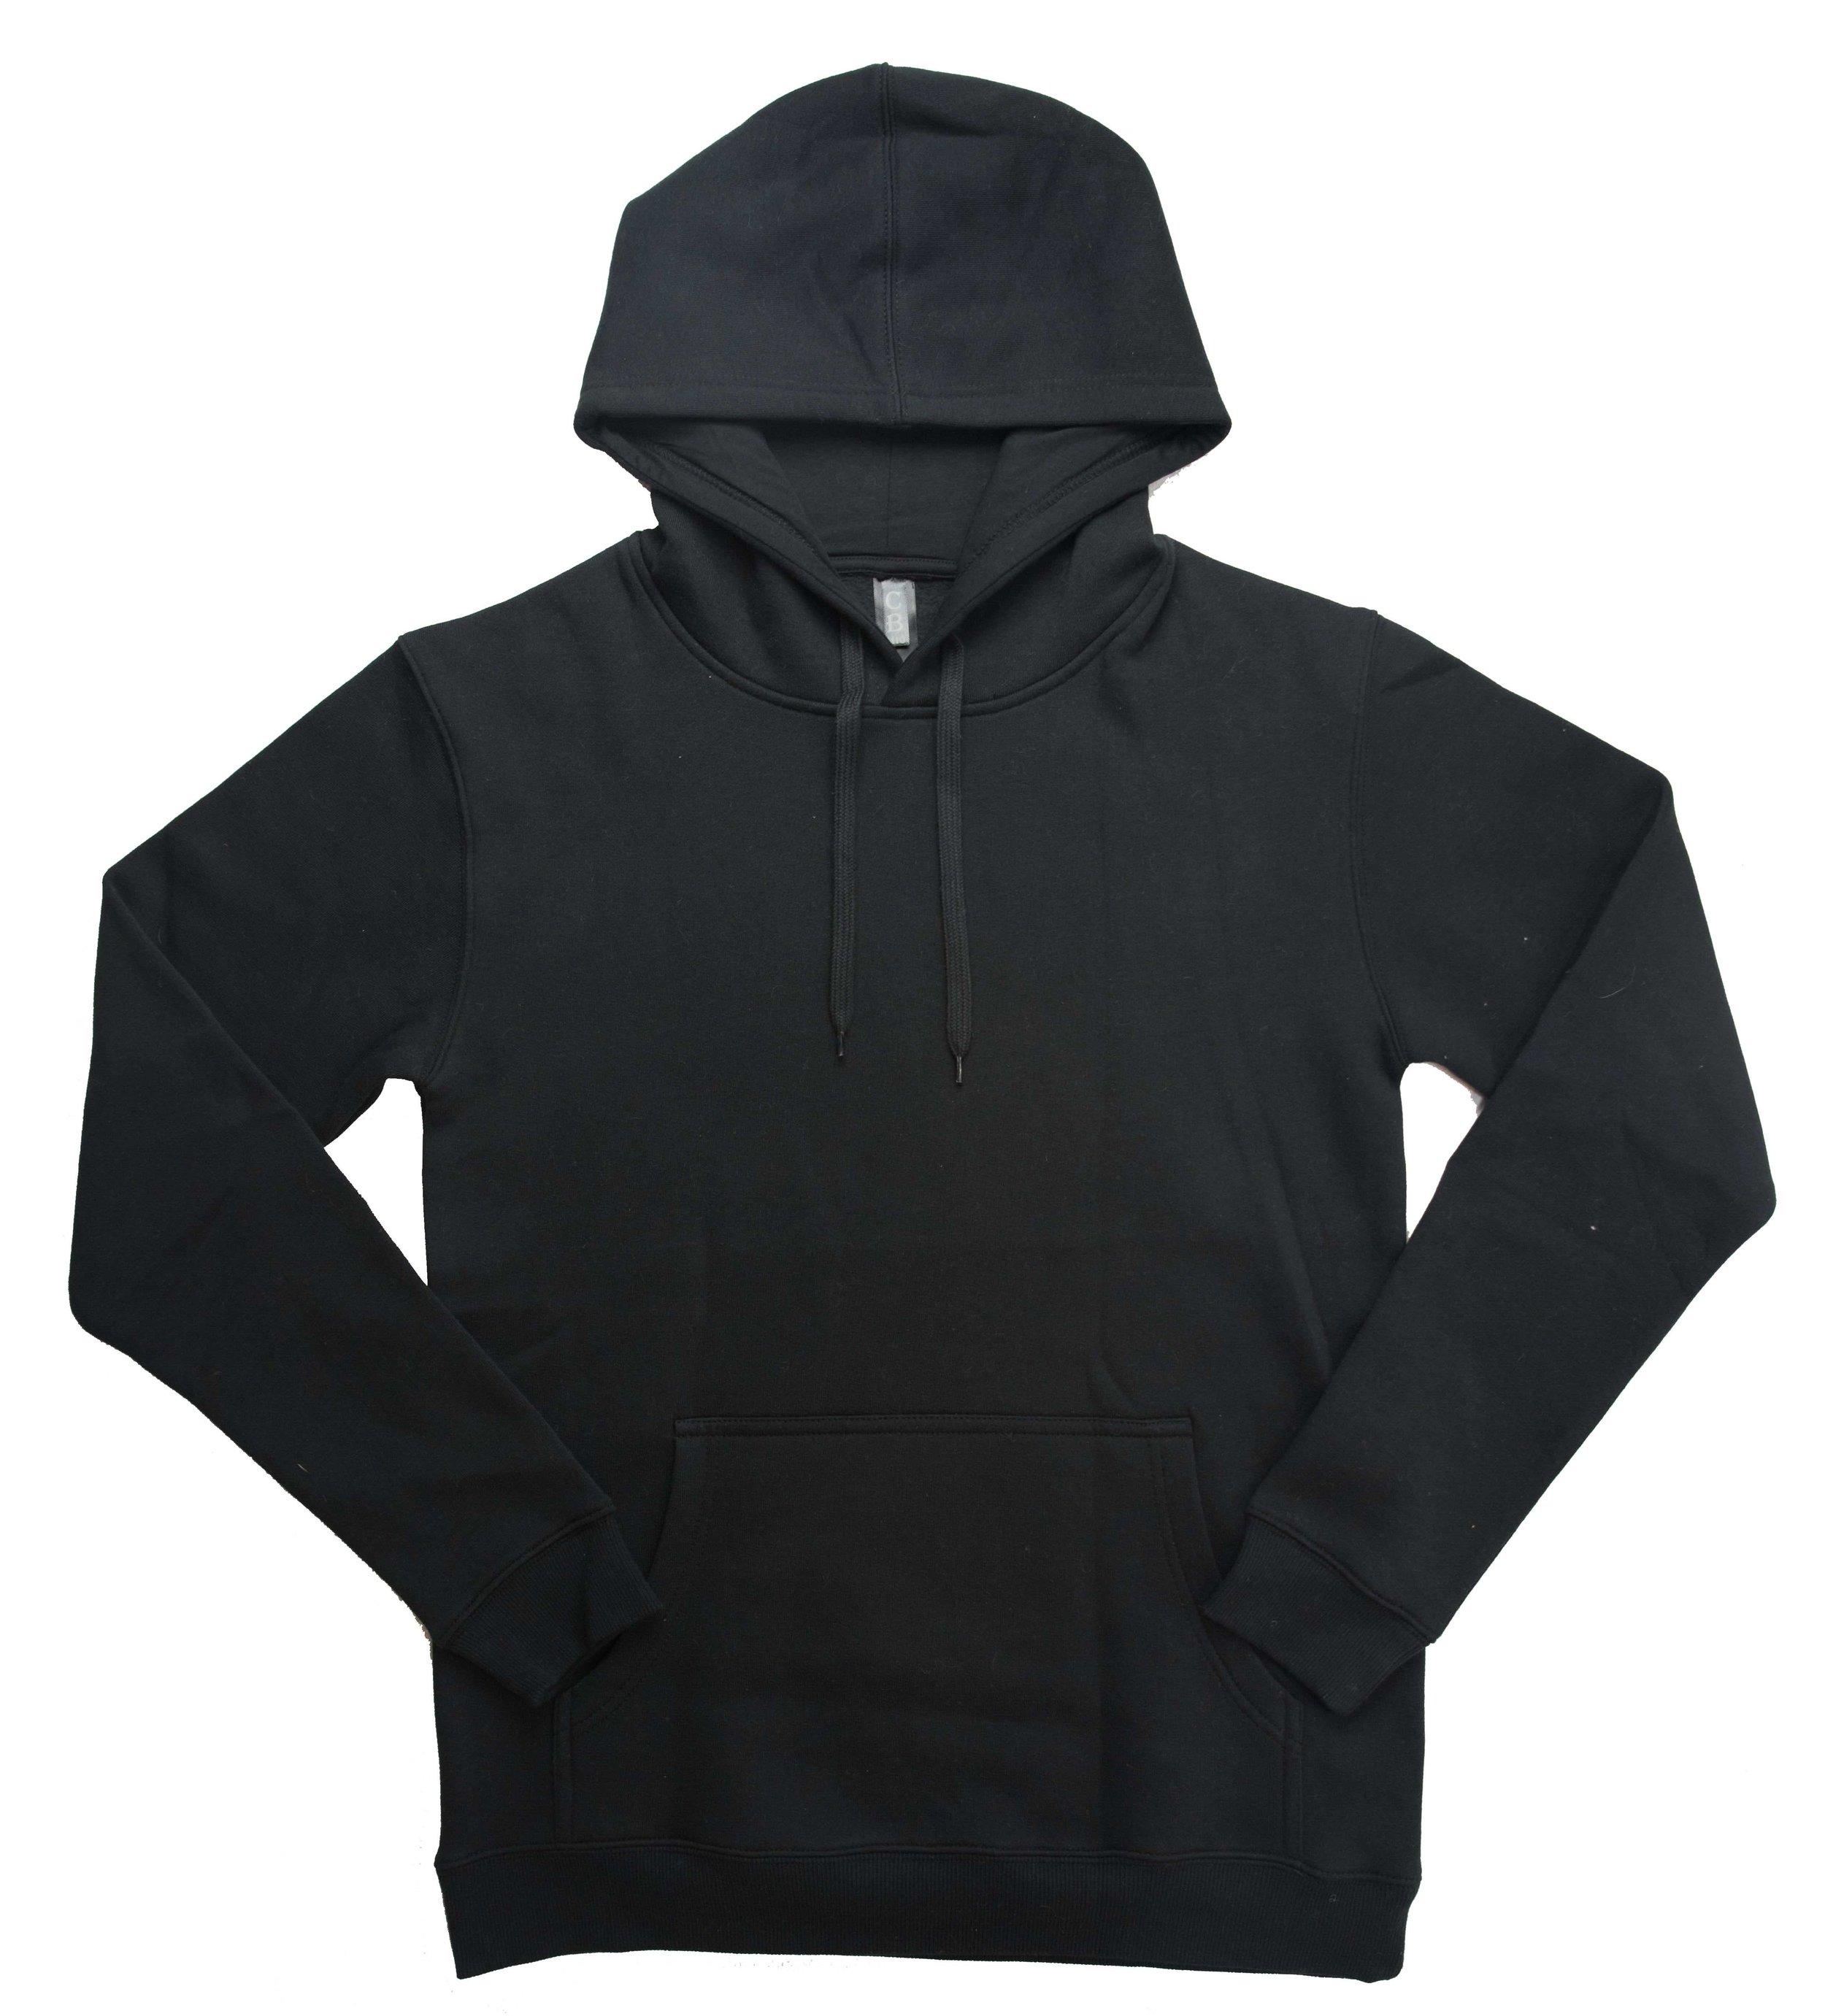 M10 - Mens Brushed Hood